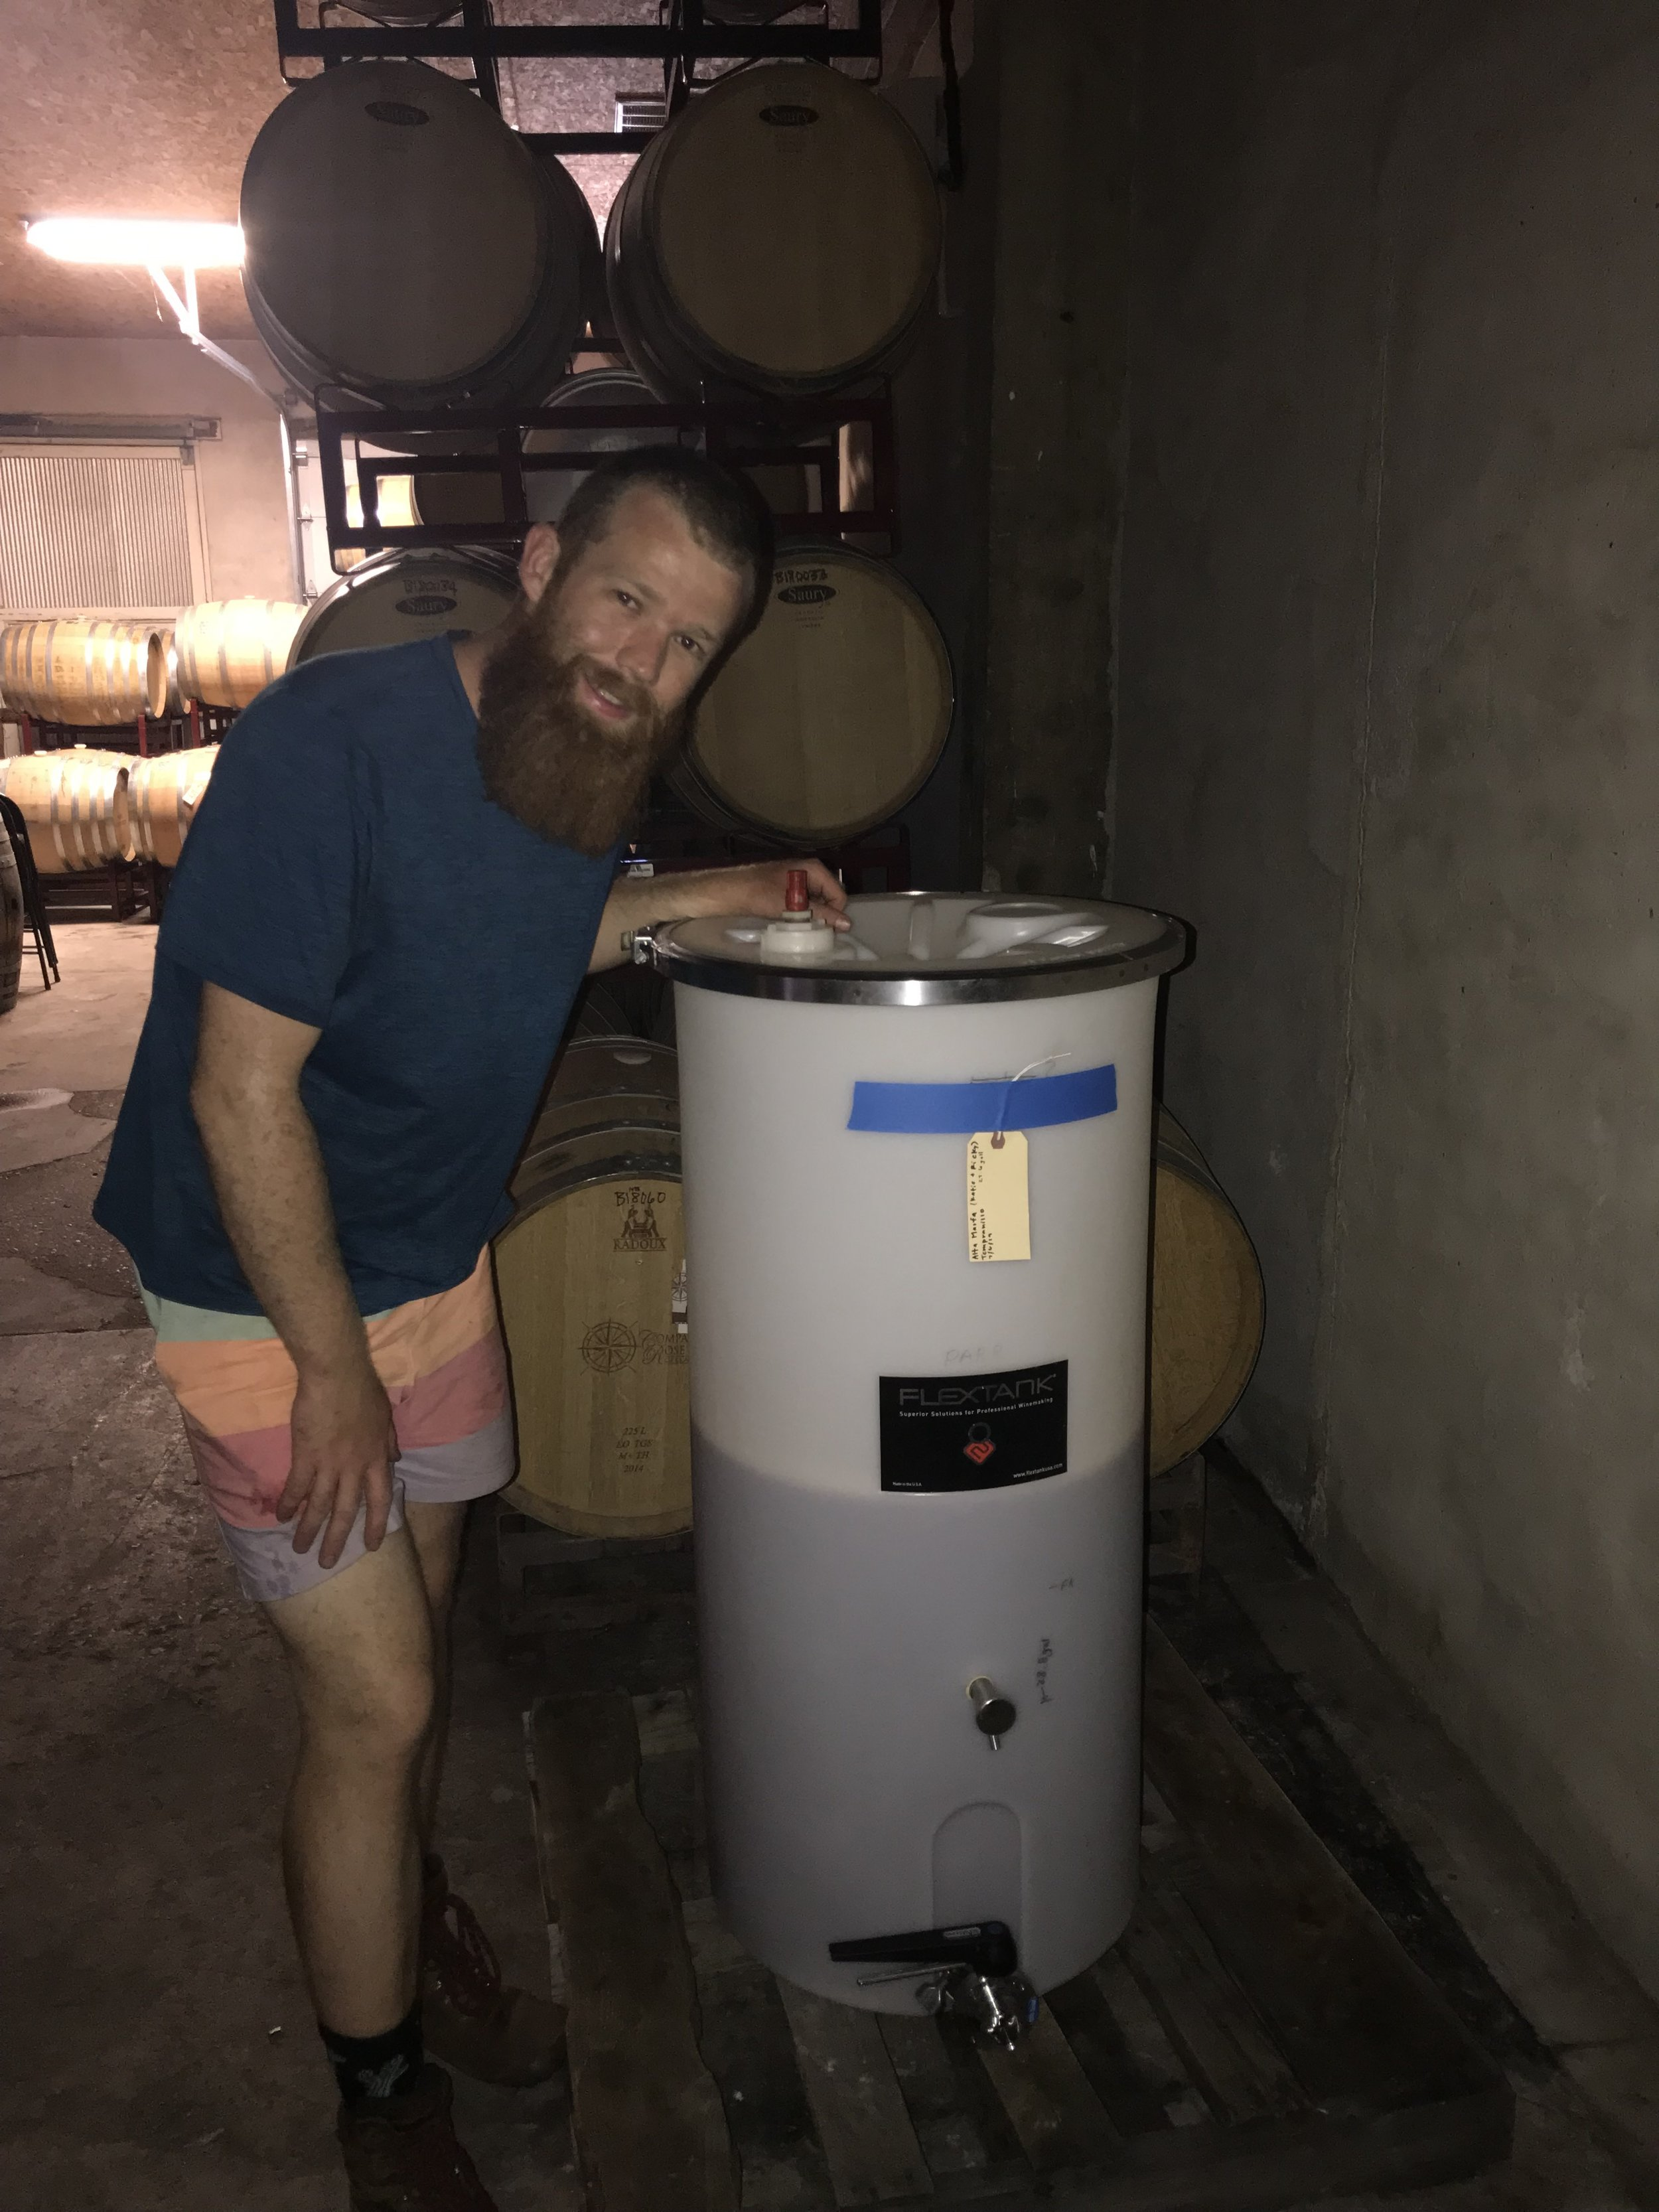 Our 29 gallons of Tempranillo rosé